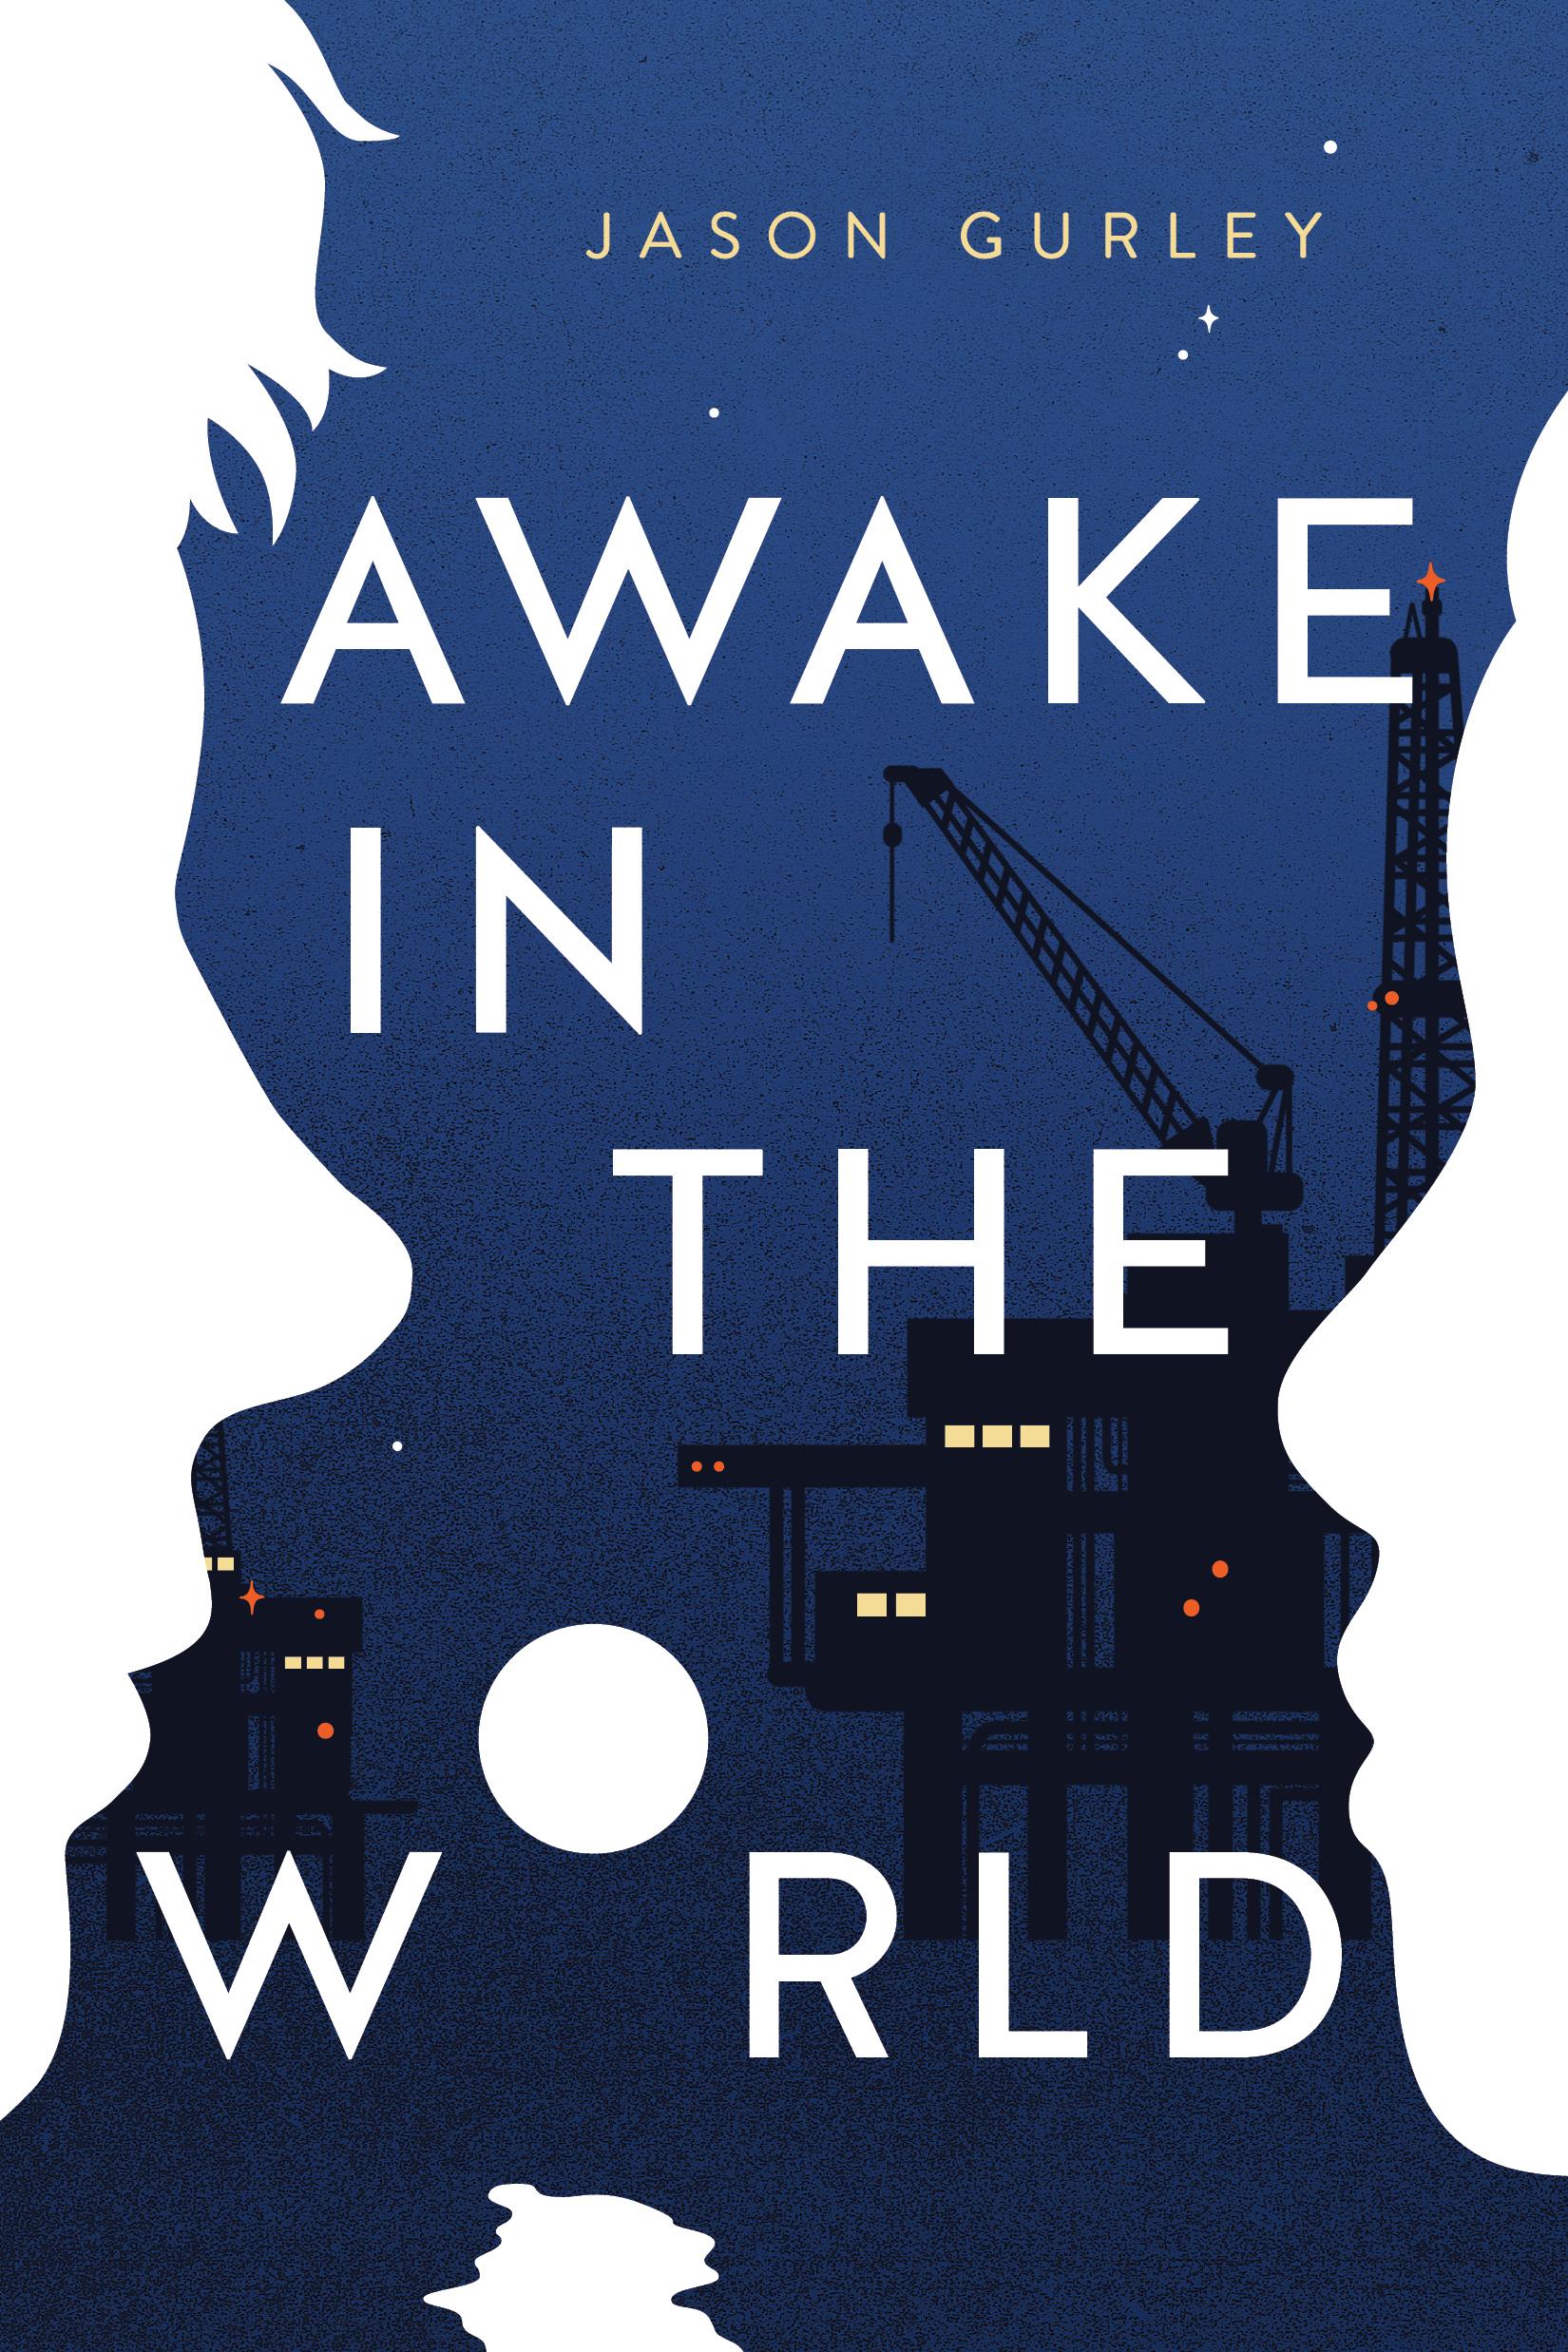 Awake In The World , Jason Gurley  For Roaring Brook Press.